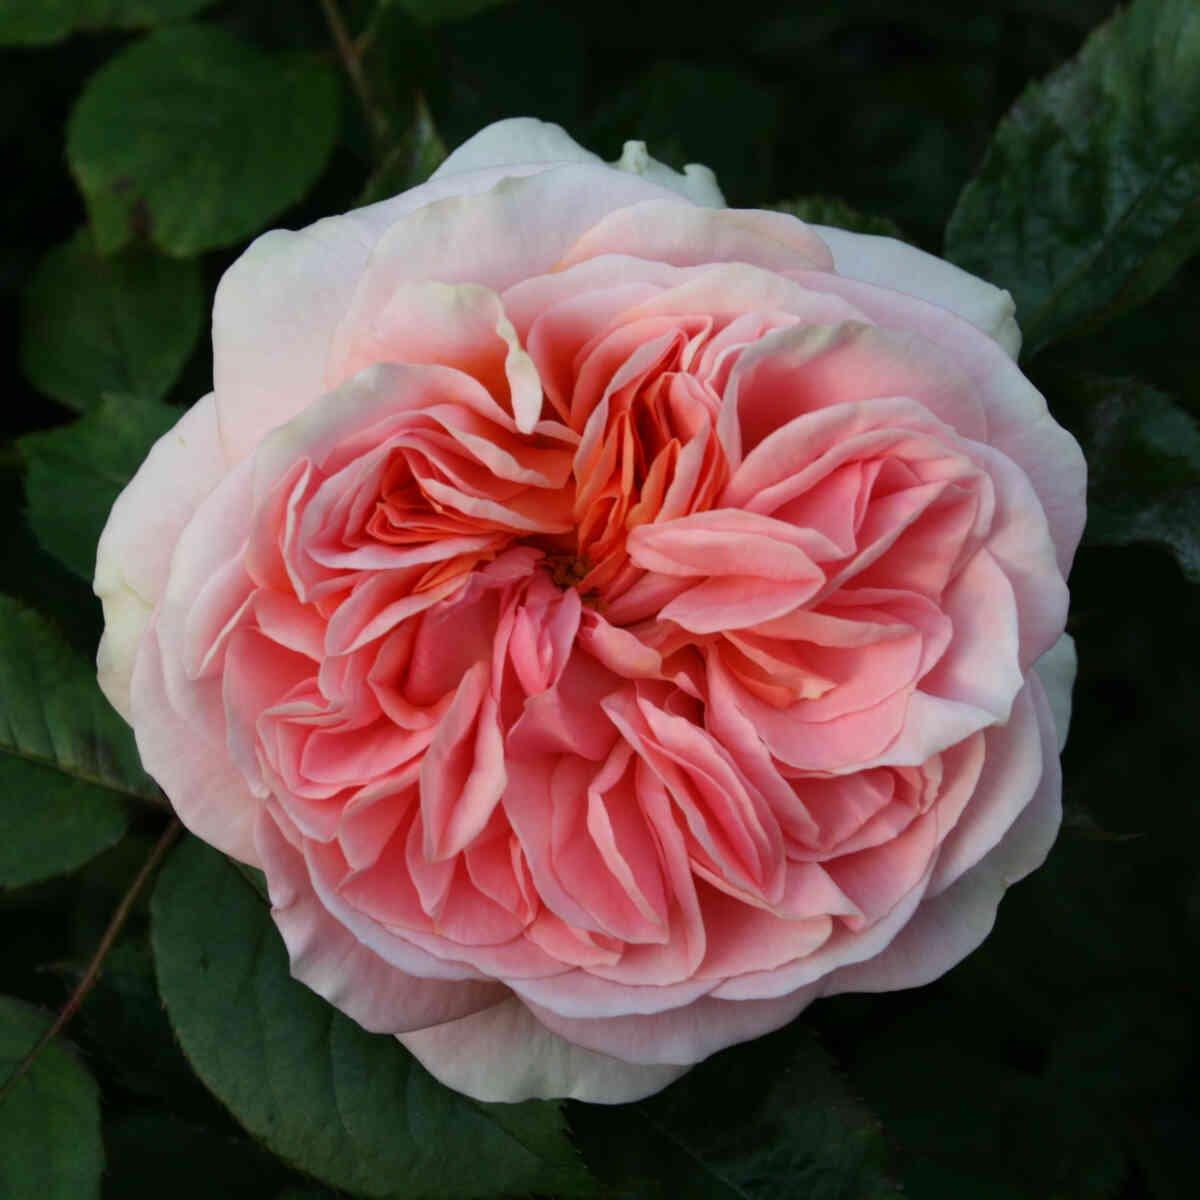 Rose 'Ghita Renaissance'